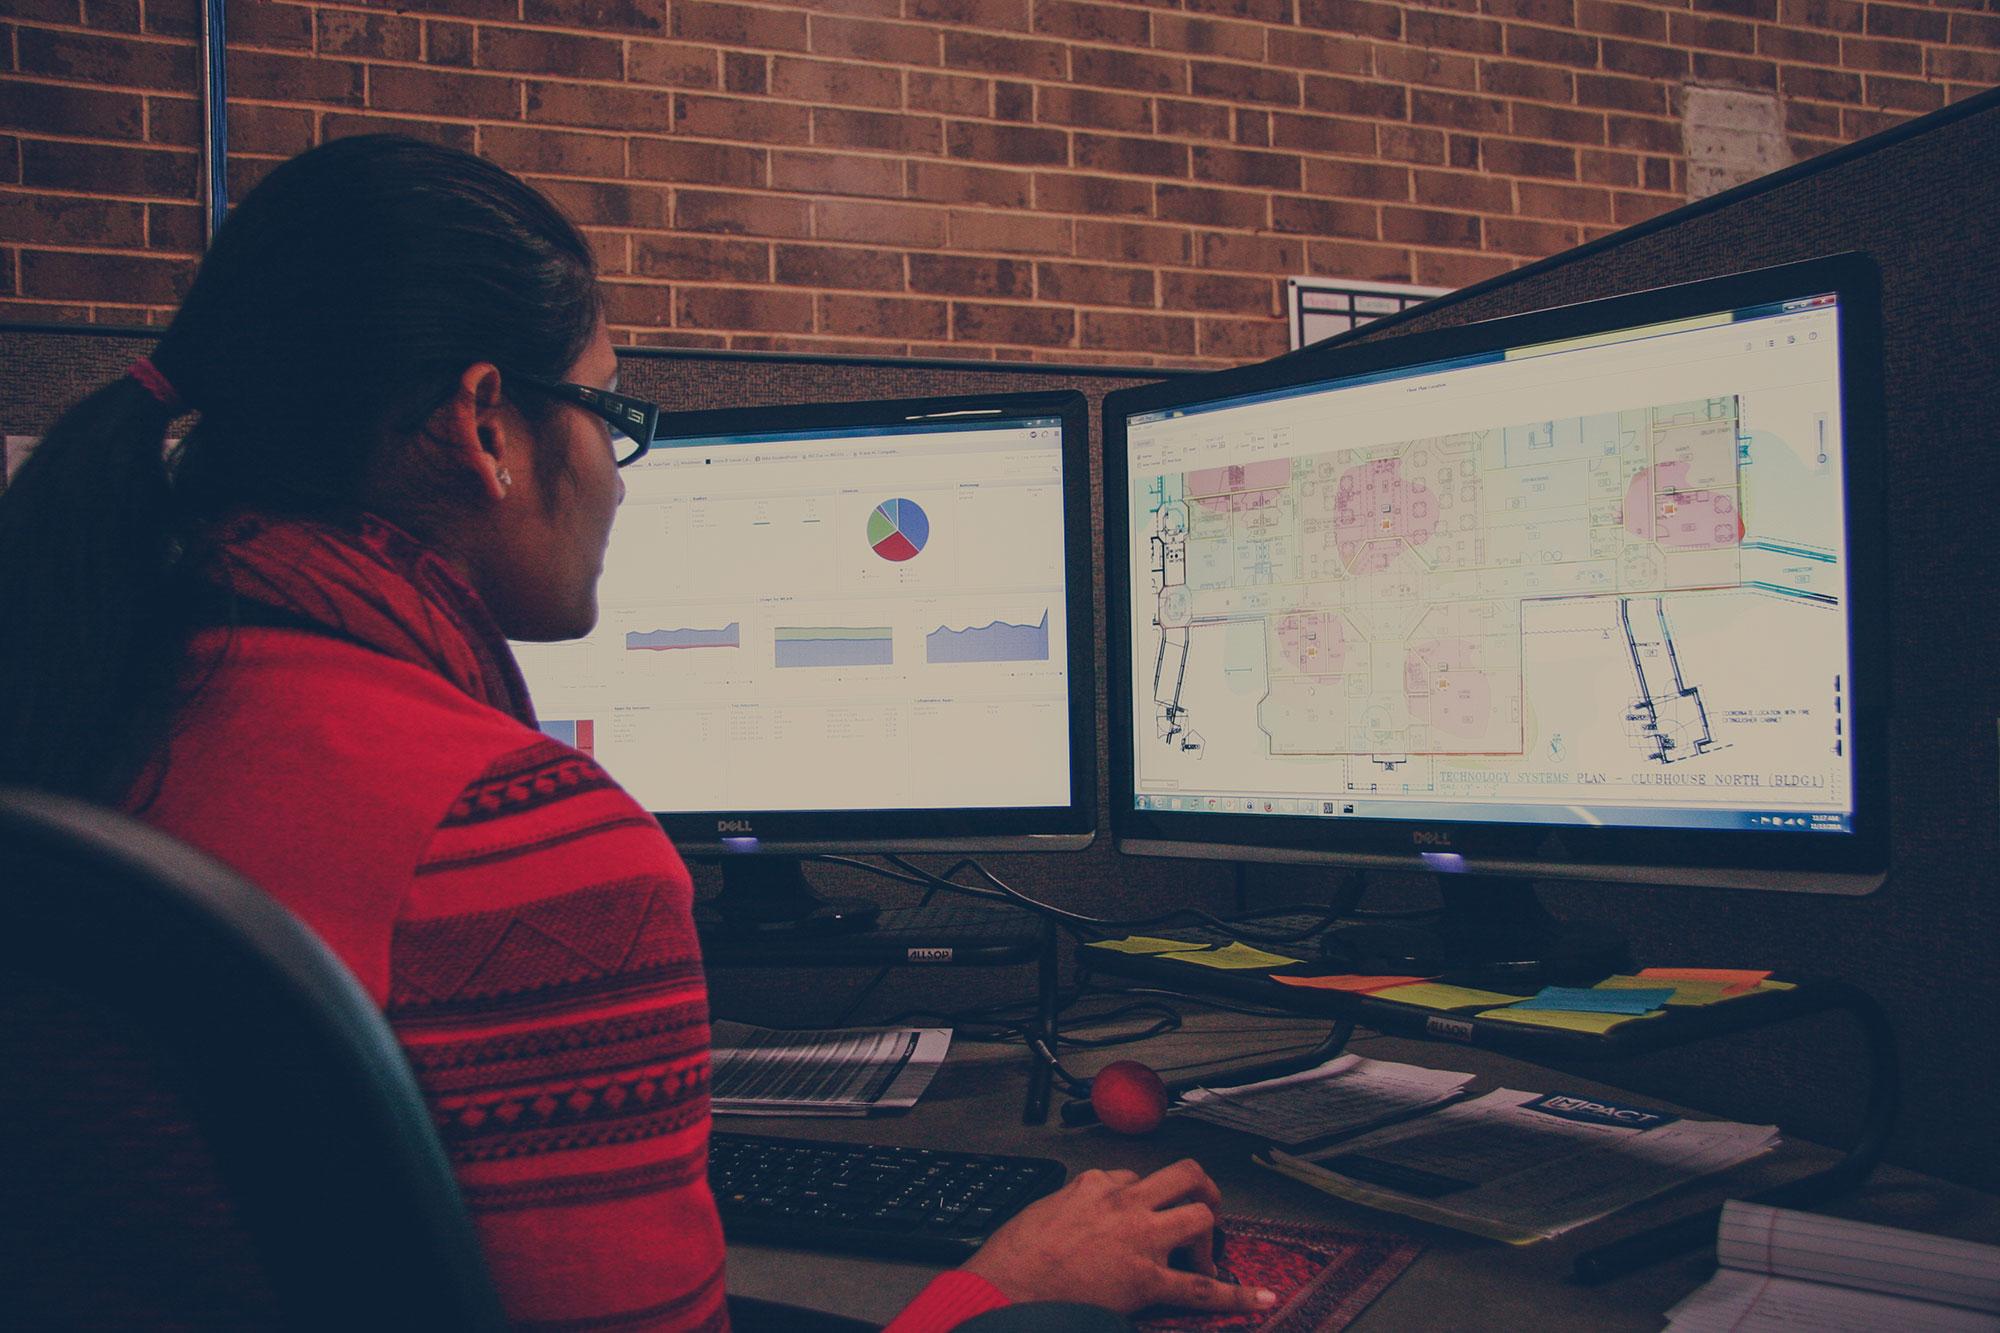 Wireless Network Design: The Fundamentals of Wireless Site Surveys